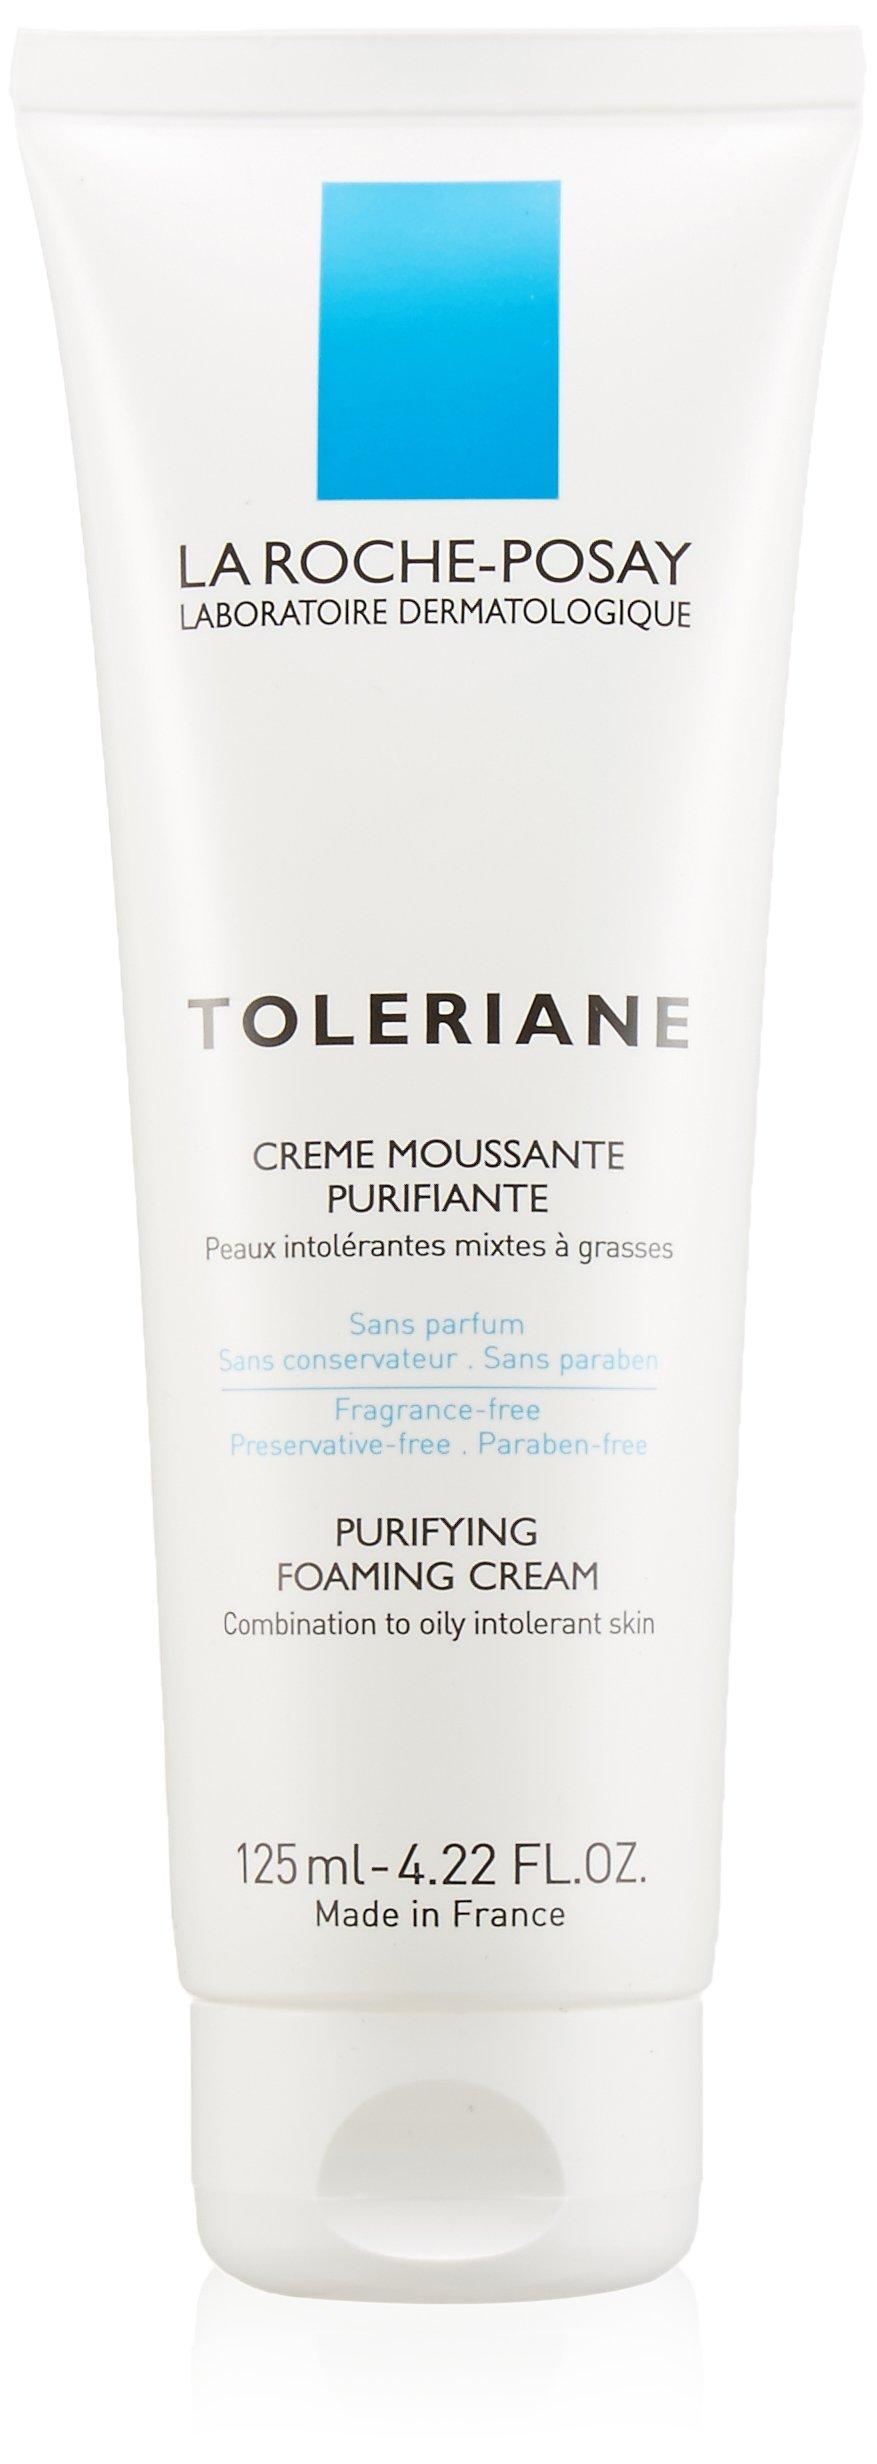 La Roche-Posay Toleriane Purifying Foaming Cream Facial Cleanser for Sensitive Skin with Glycerin, 4.22 Fl. Oz.